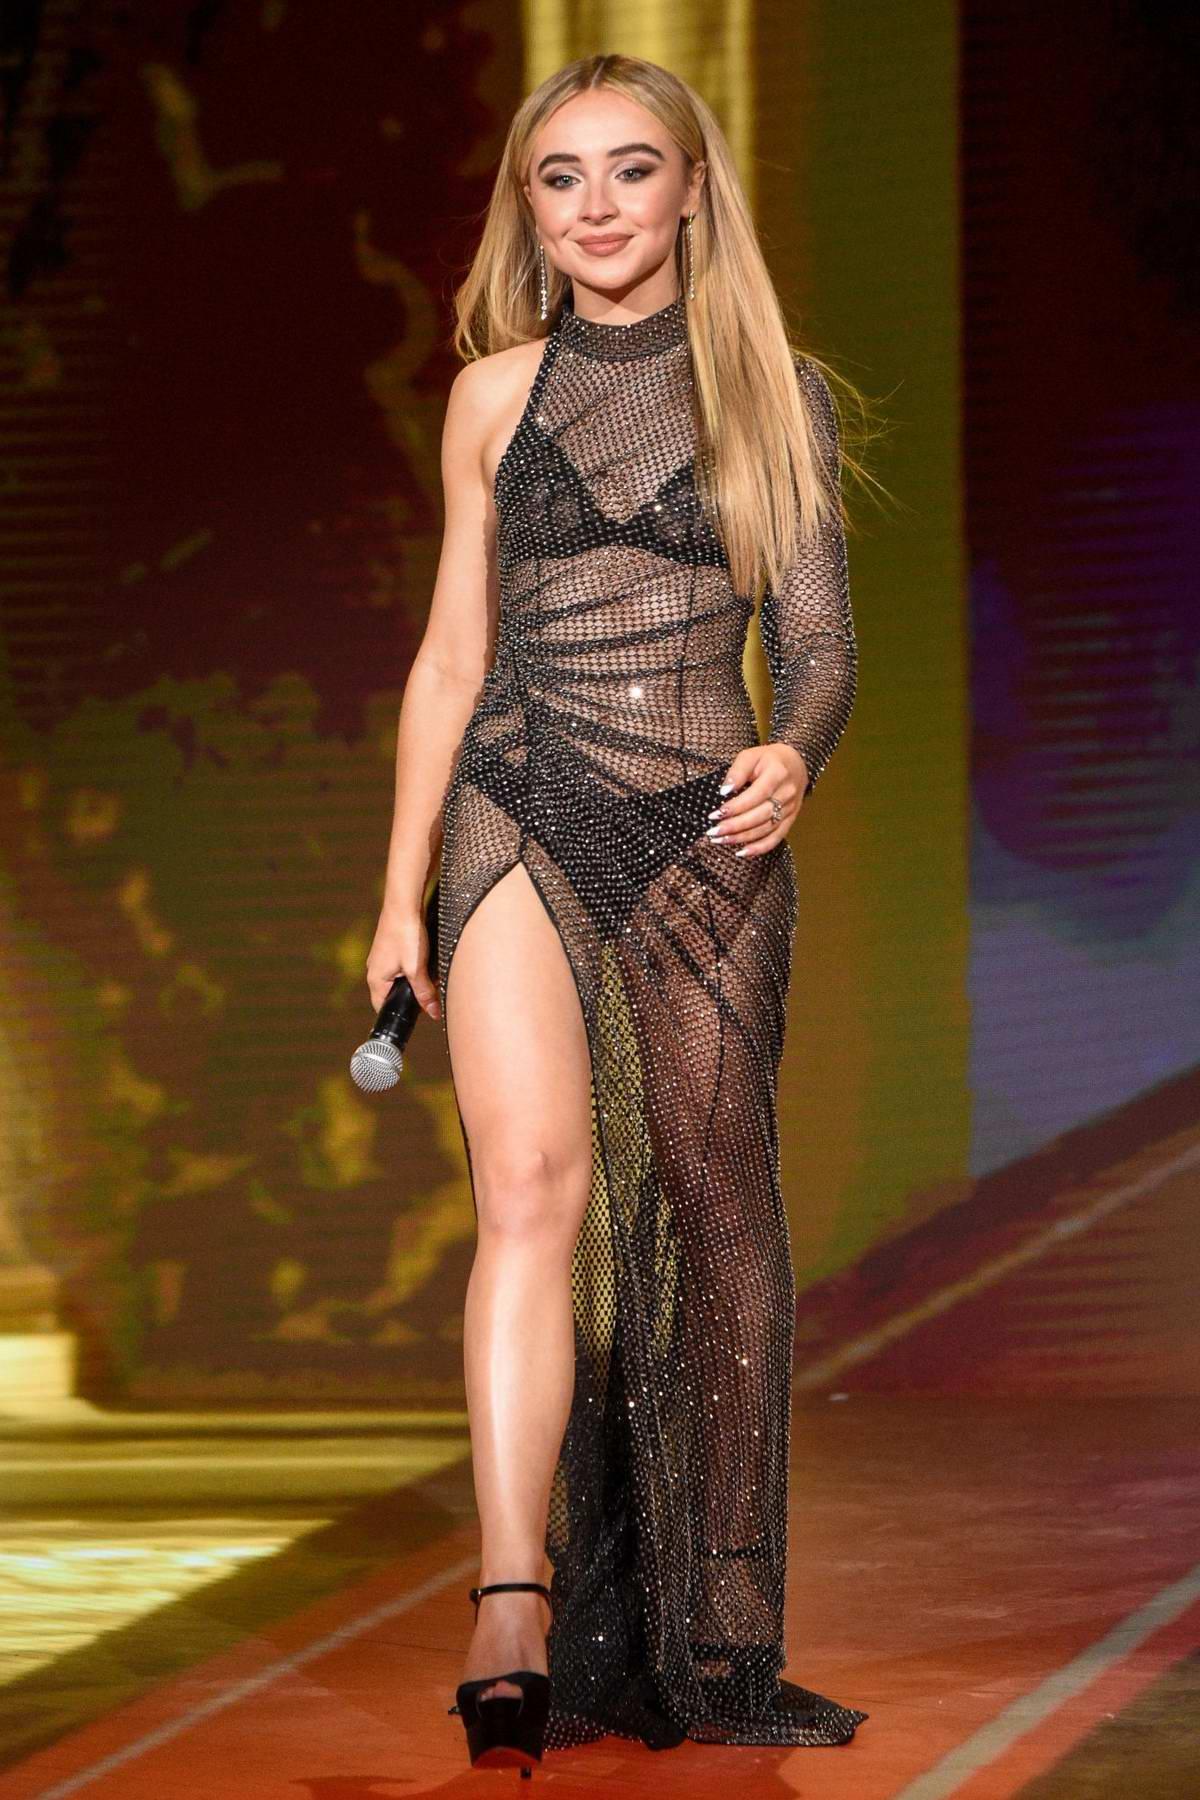 Sabrina Carpenter attends the 2020 MTV Movie & TV Awards in Los Angeles